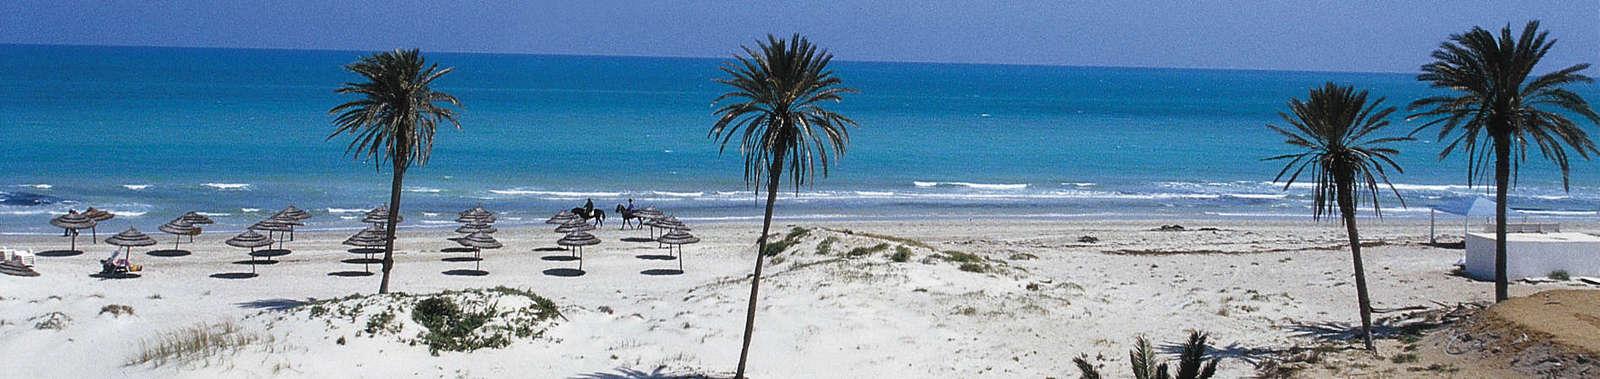 7RadissonDjerbaRSRTDjerba-Beach2